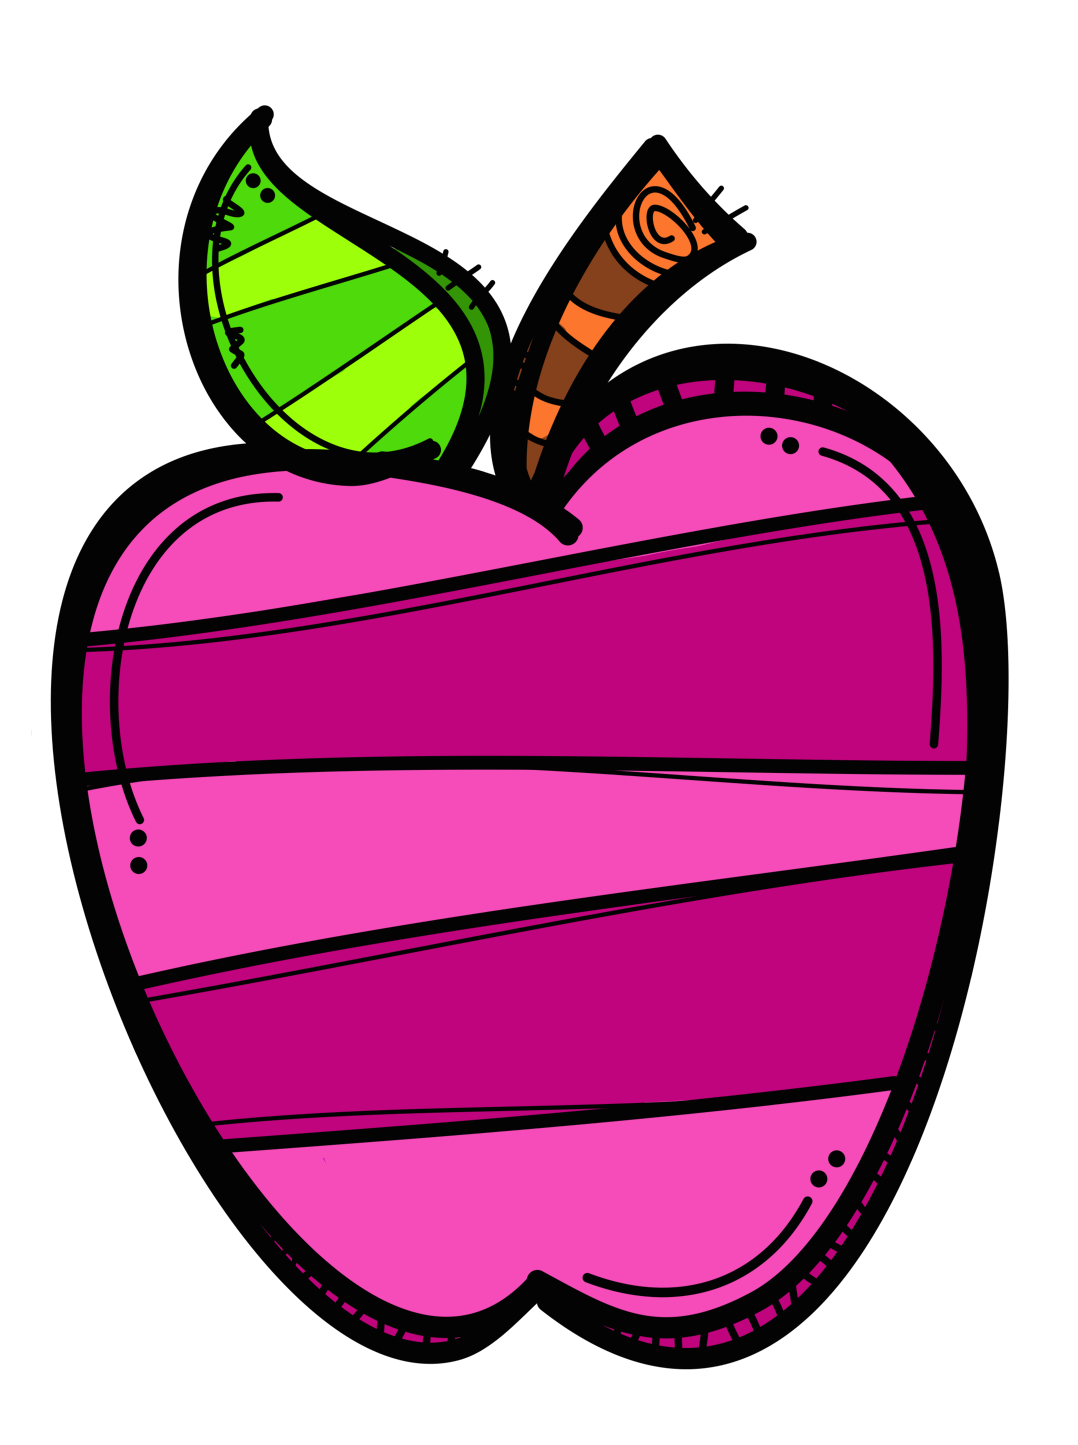 Apple school clipart vector free download ✿*UY..QUE TE COMO*✿* | MelonHeadz | Pinterest | Clip art, Clipart ... vector free download